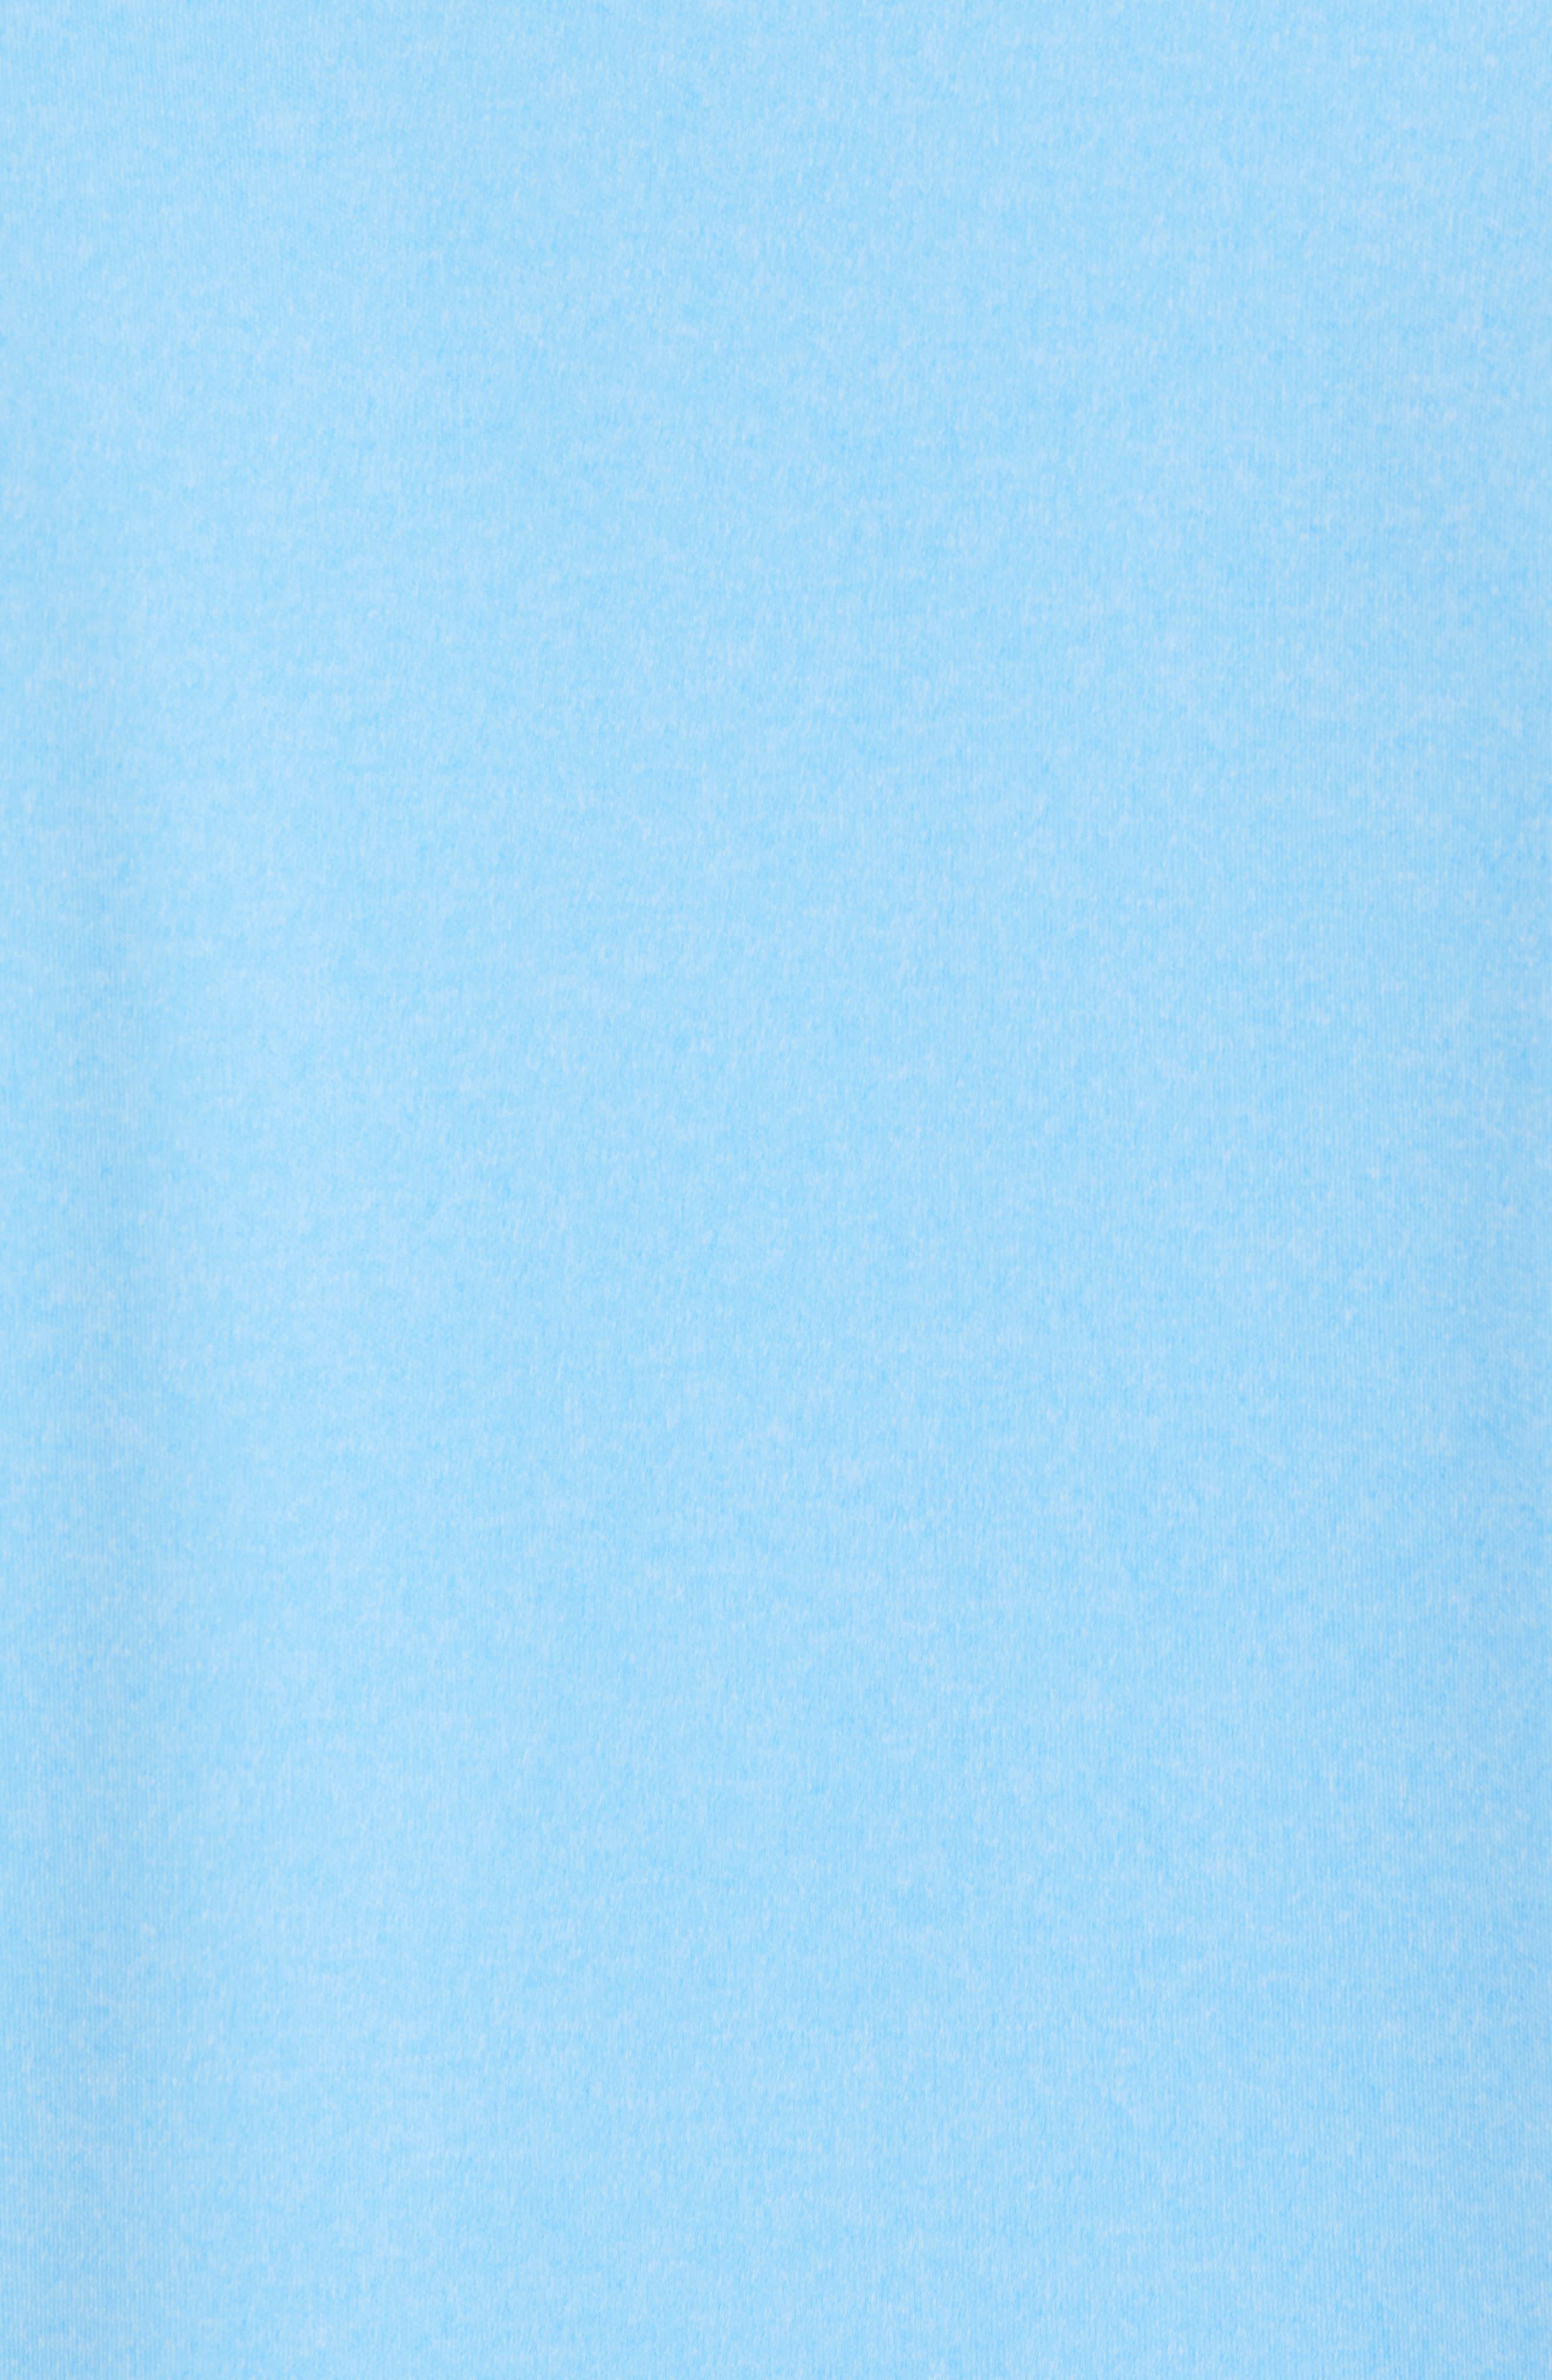 Slim Fit Active Polo,                             Alternate thumbnail 5, color,                             HACKETT BLUE